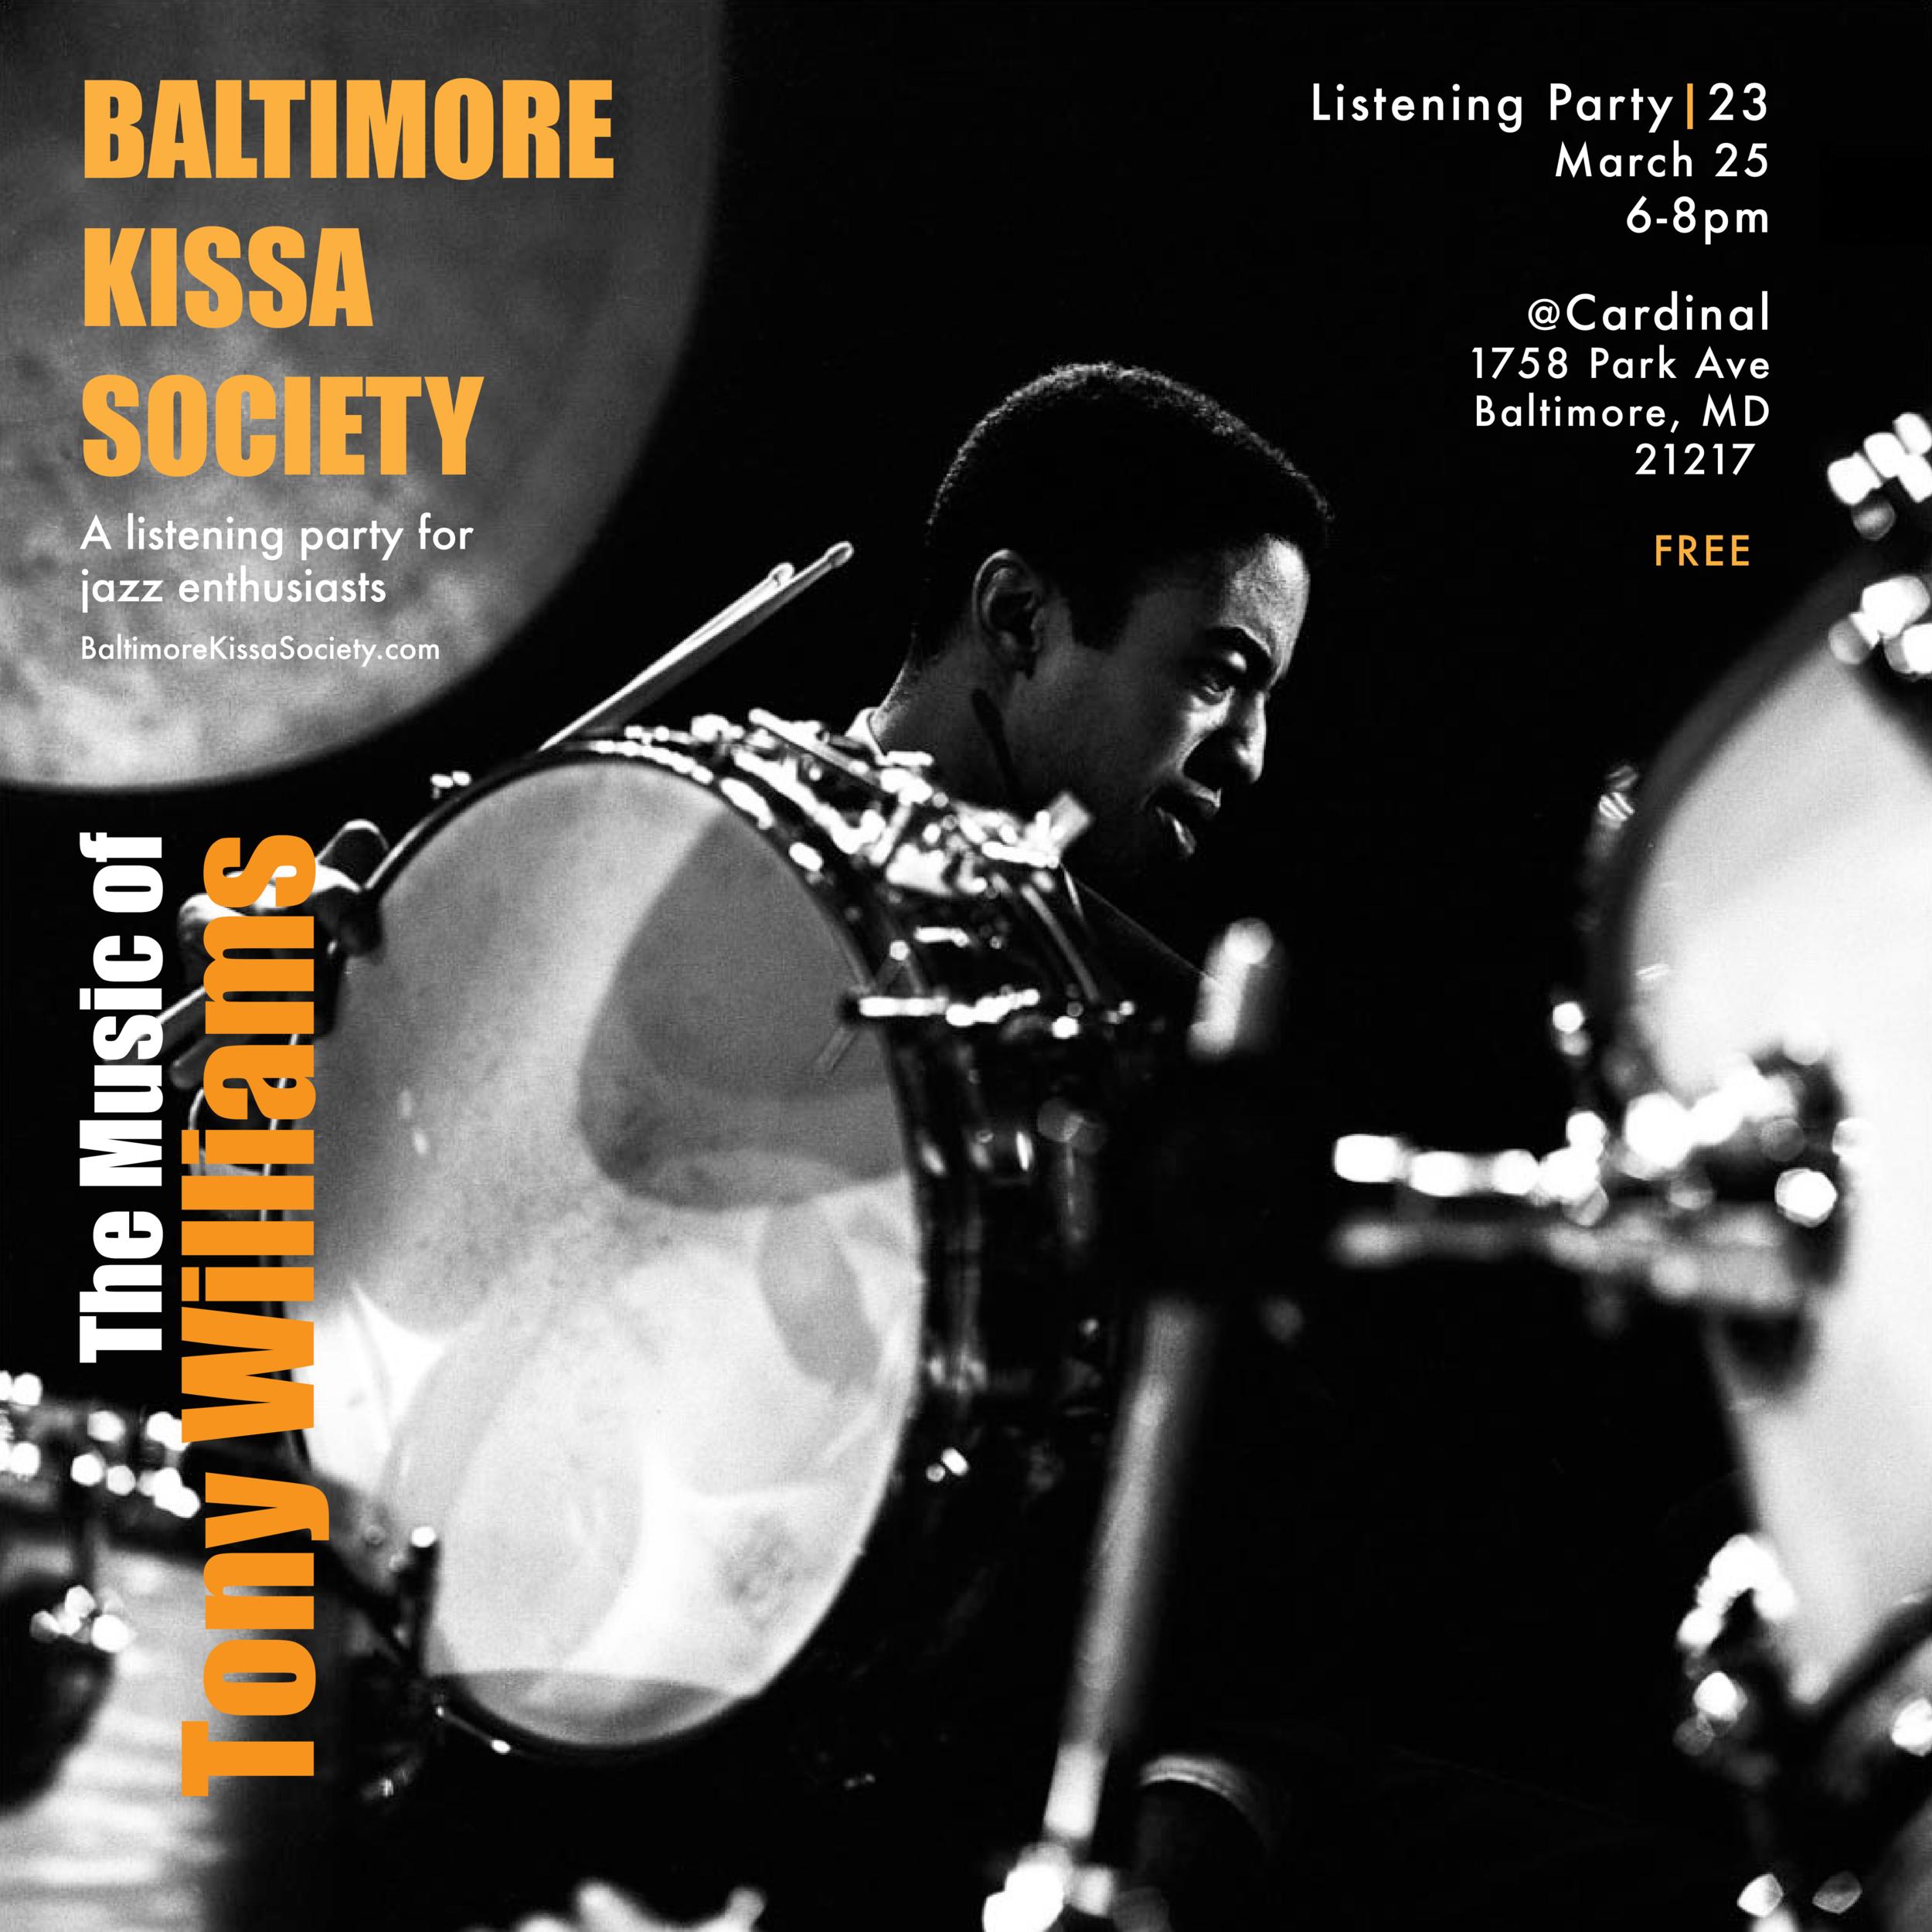 Baltimore Kissa Society LP23 - Flyer Draft v1.png